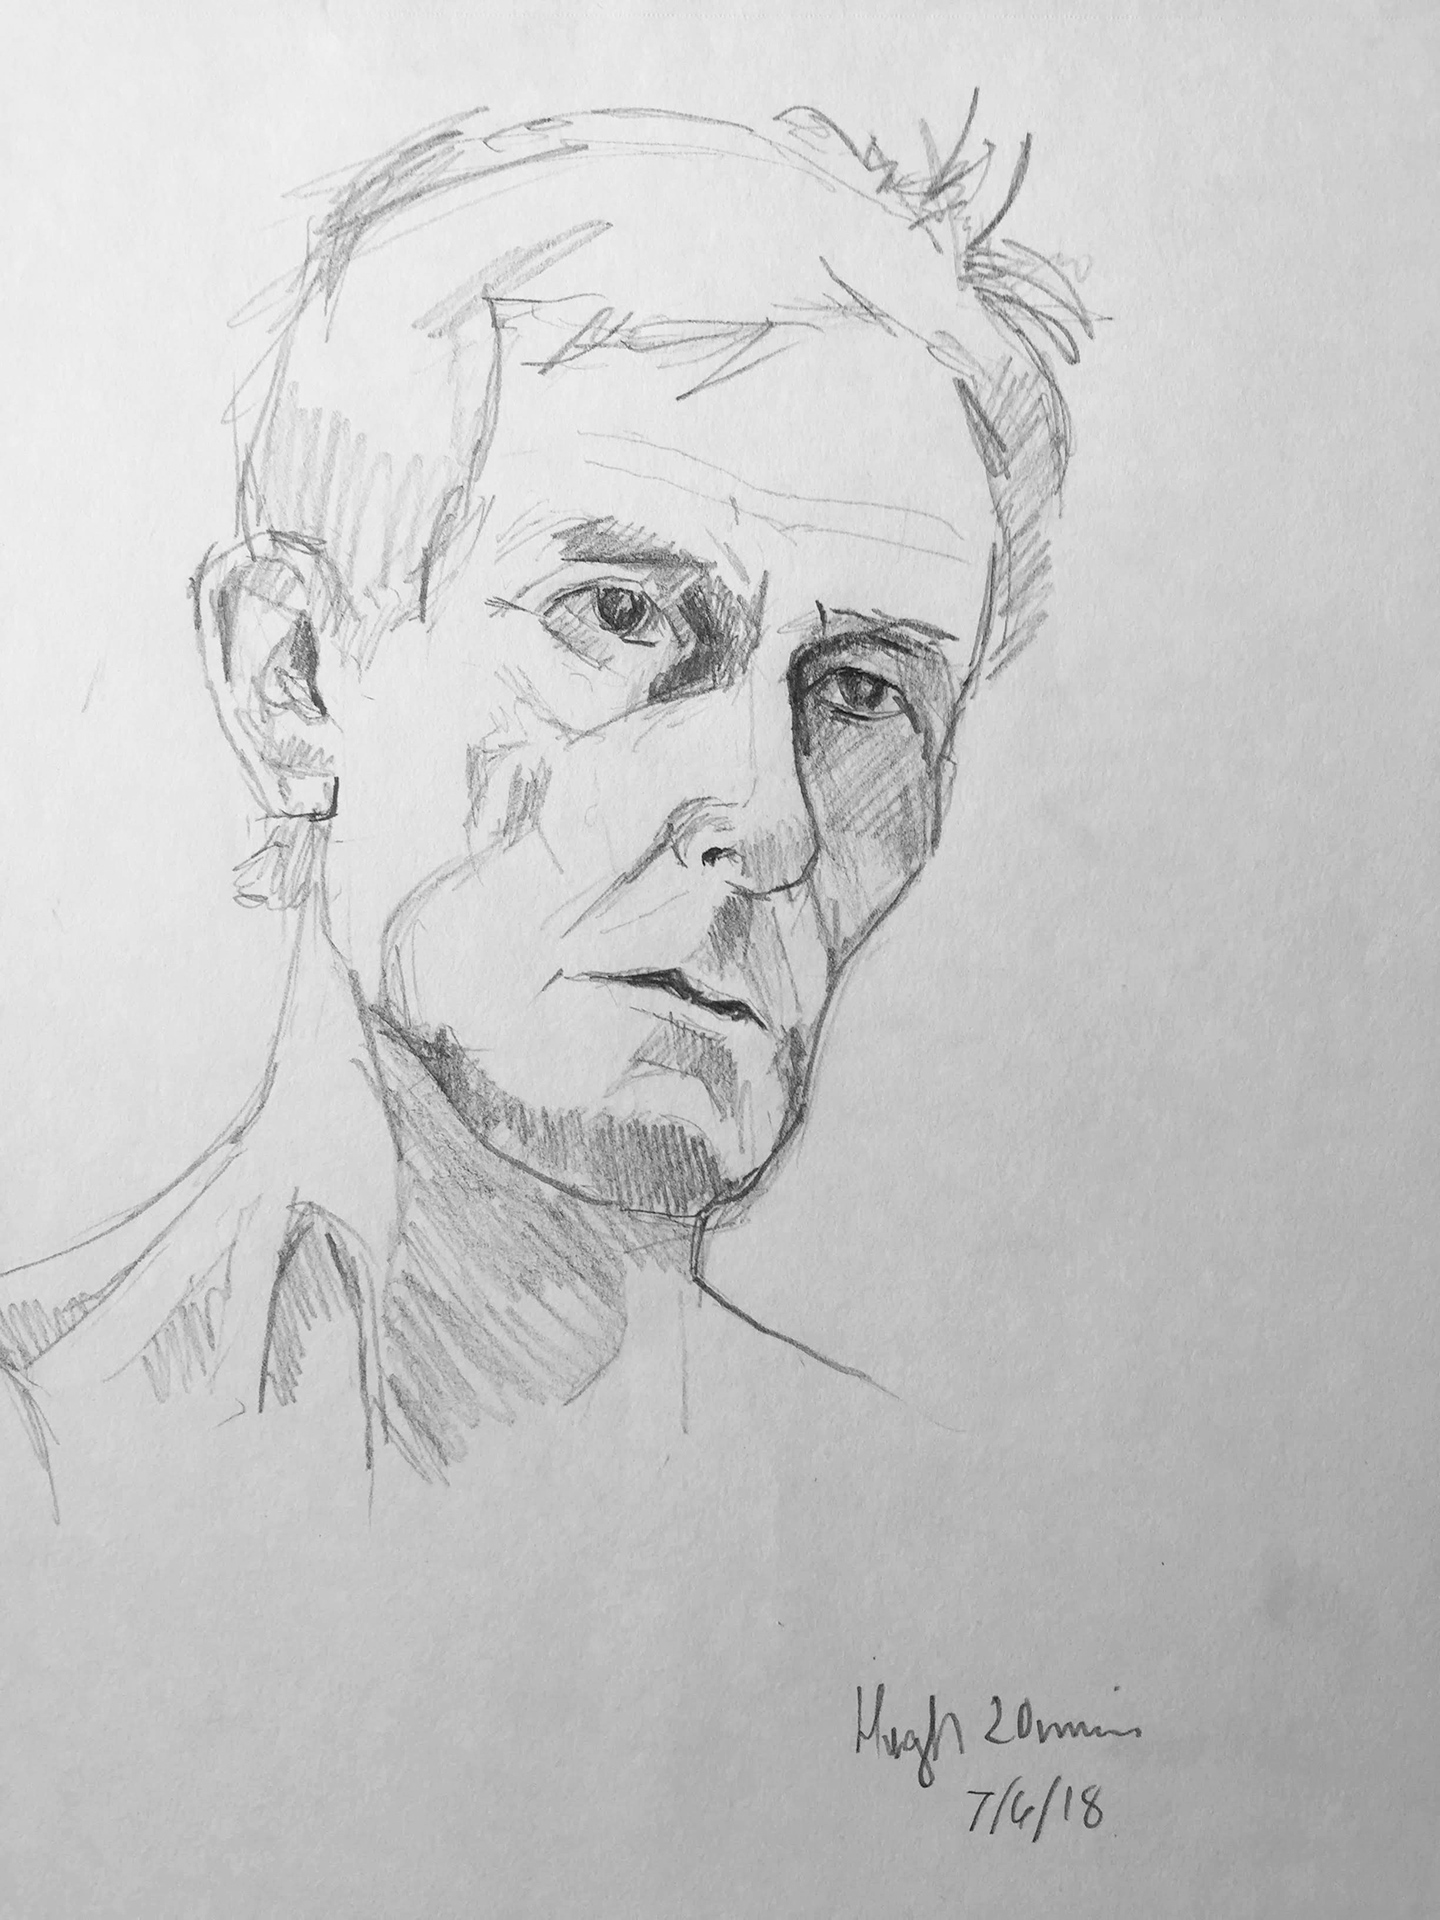 Life Drawing Sketch 1, 7/6/18